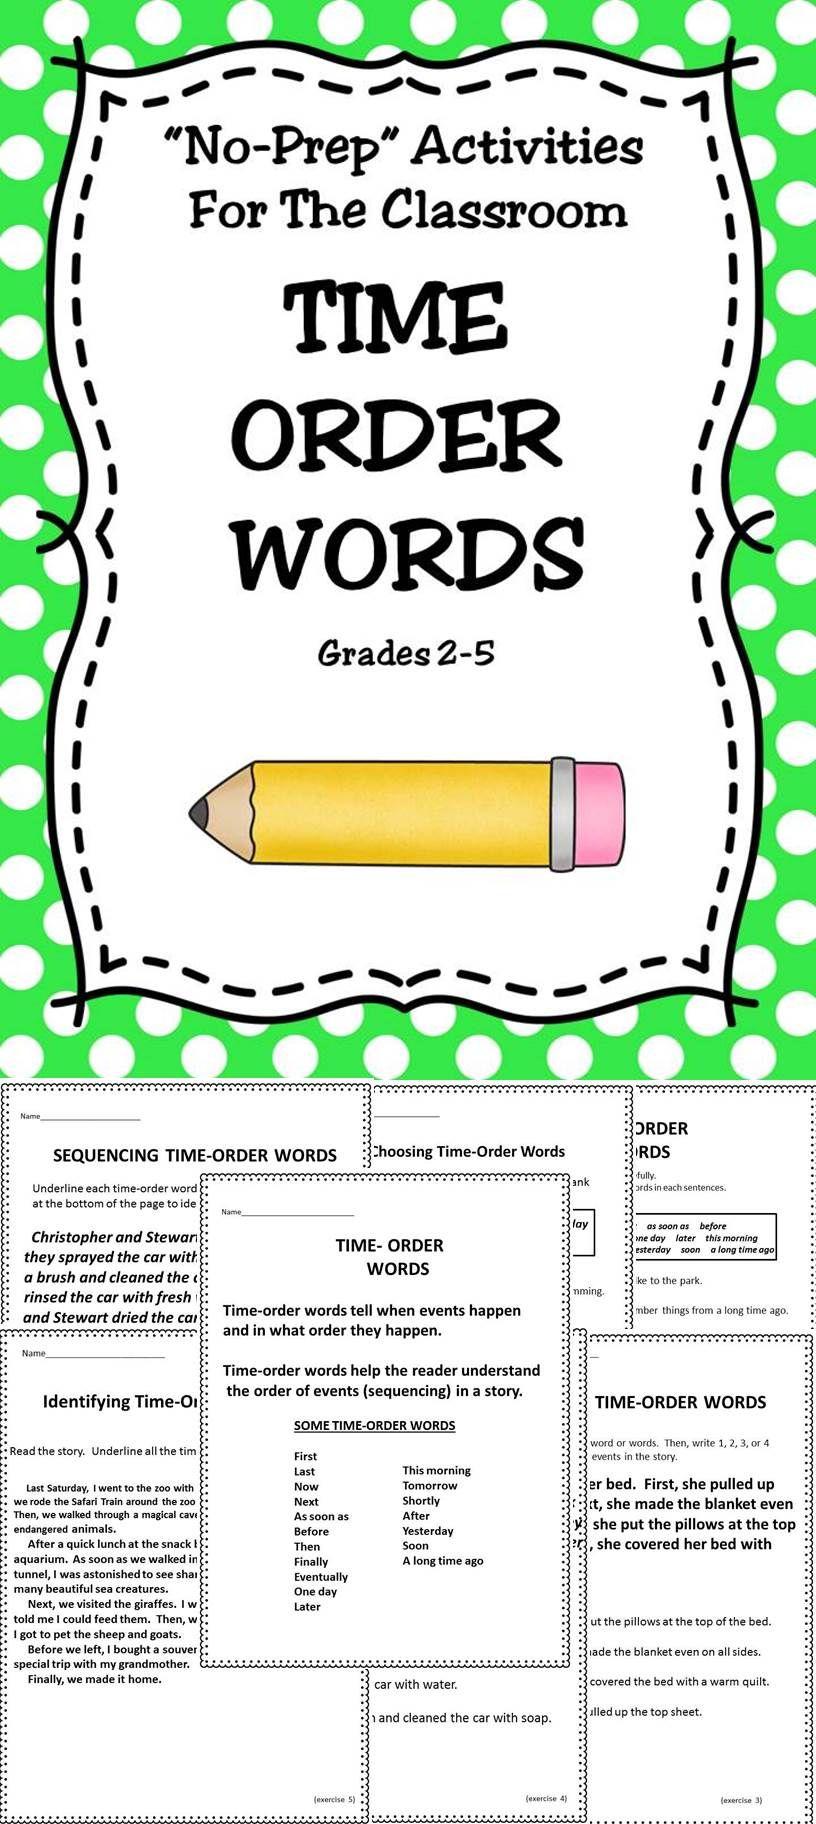 Time Order Words Time Order Words Reading Comprehension Worksheets Language Arts Lessons [ 1824 x 816 Pixel ]